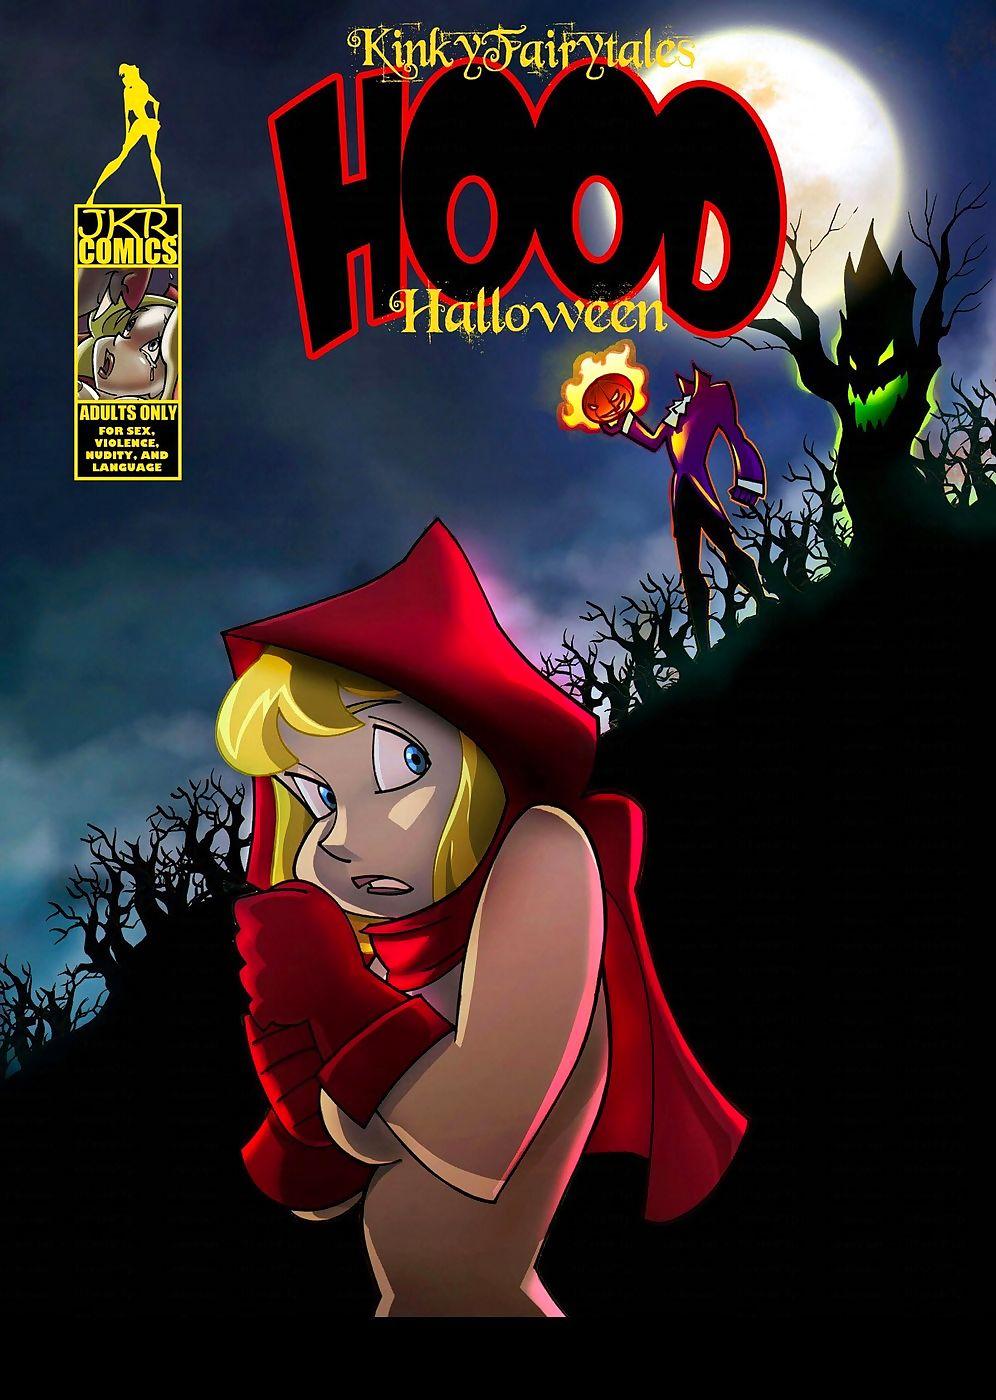 JKR- Thug Halloween- Oddball Sapphist tales